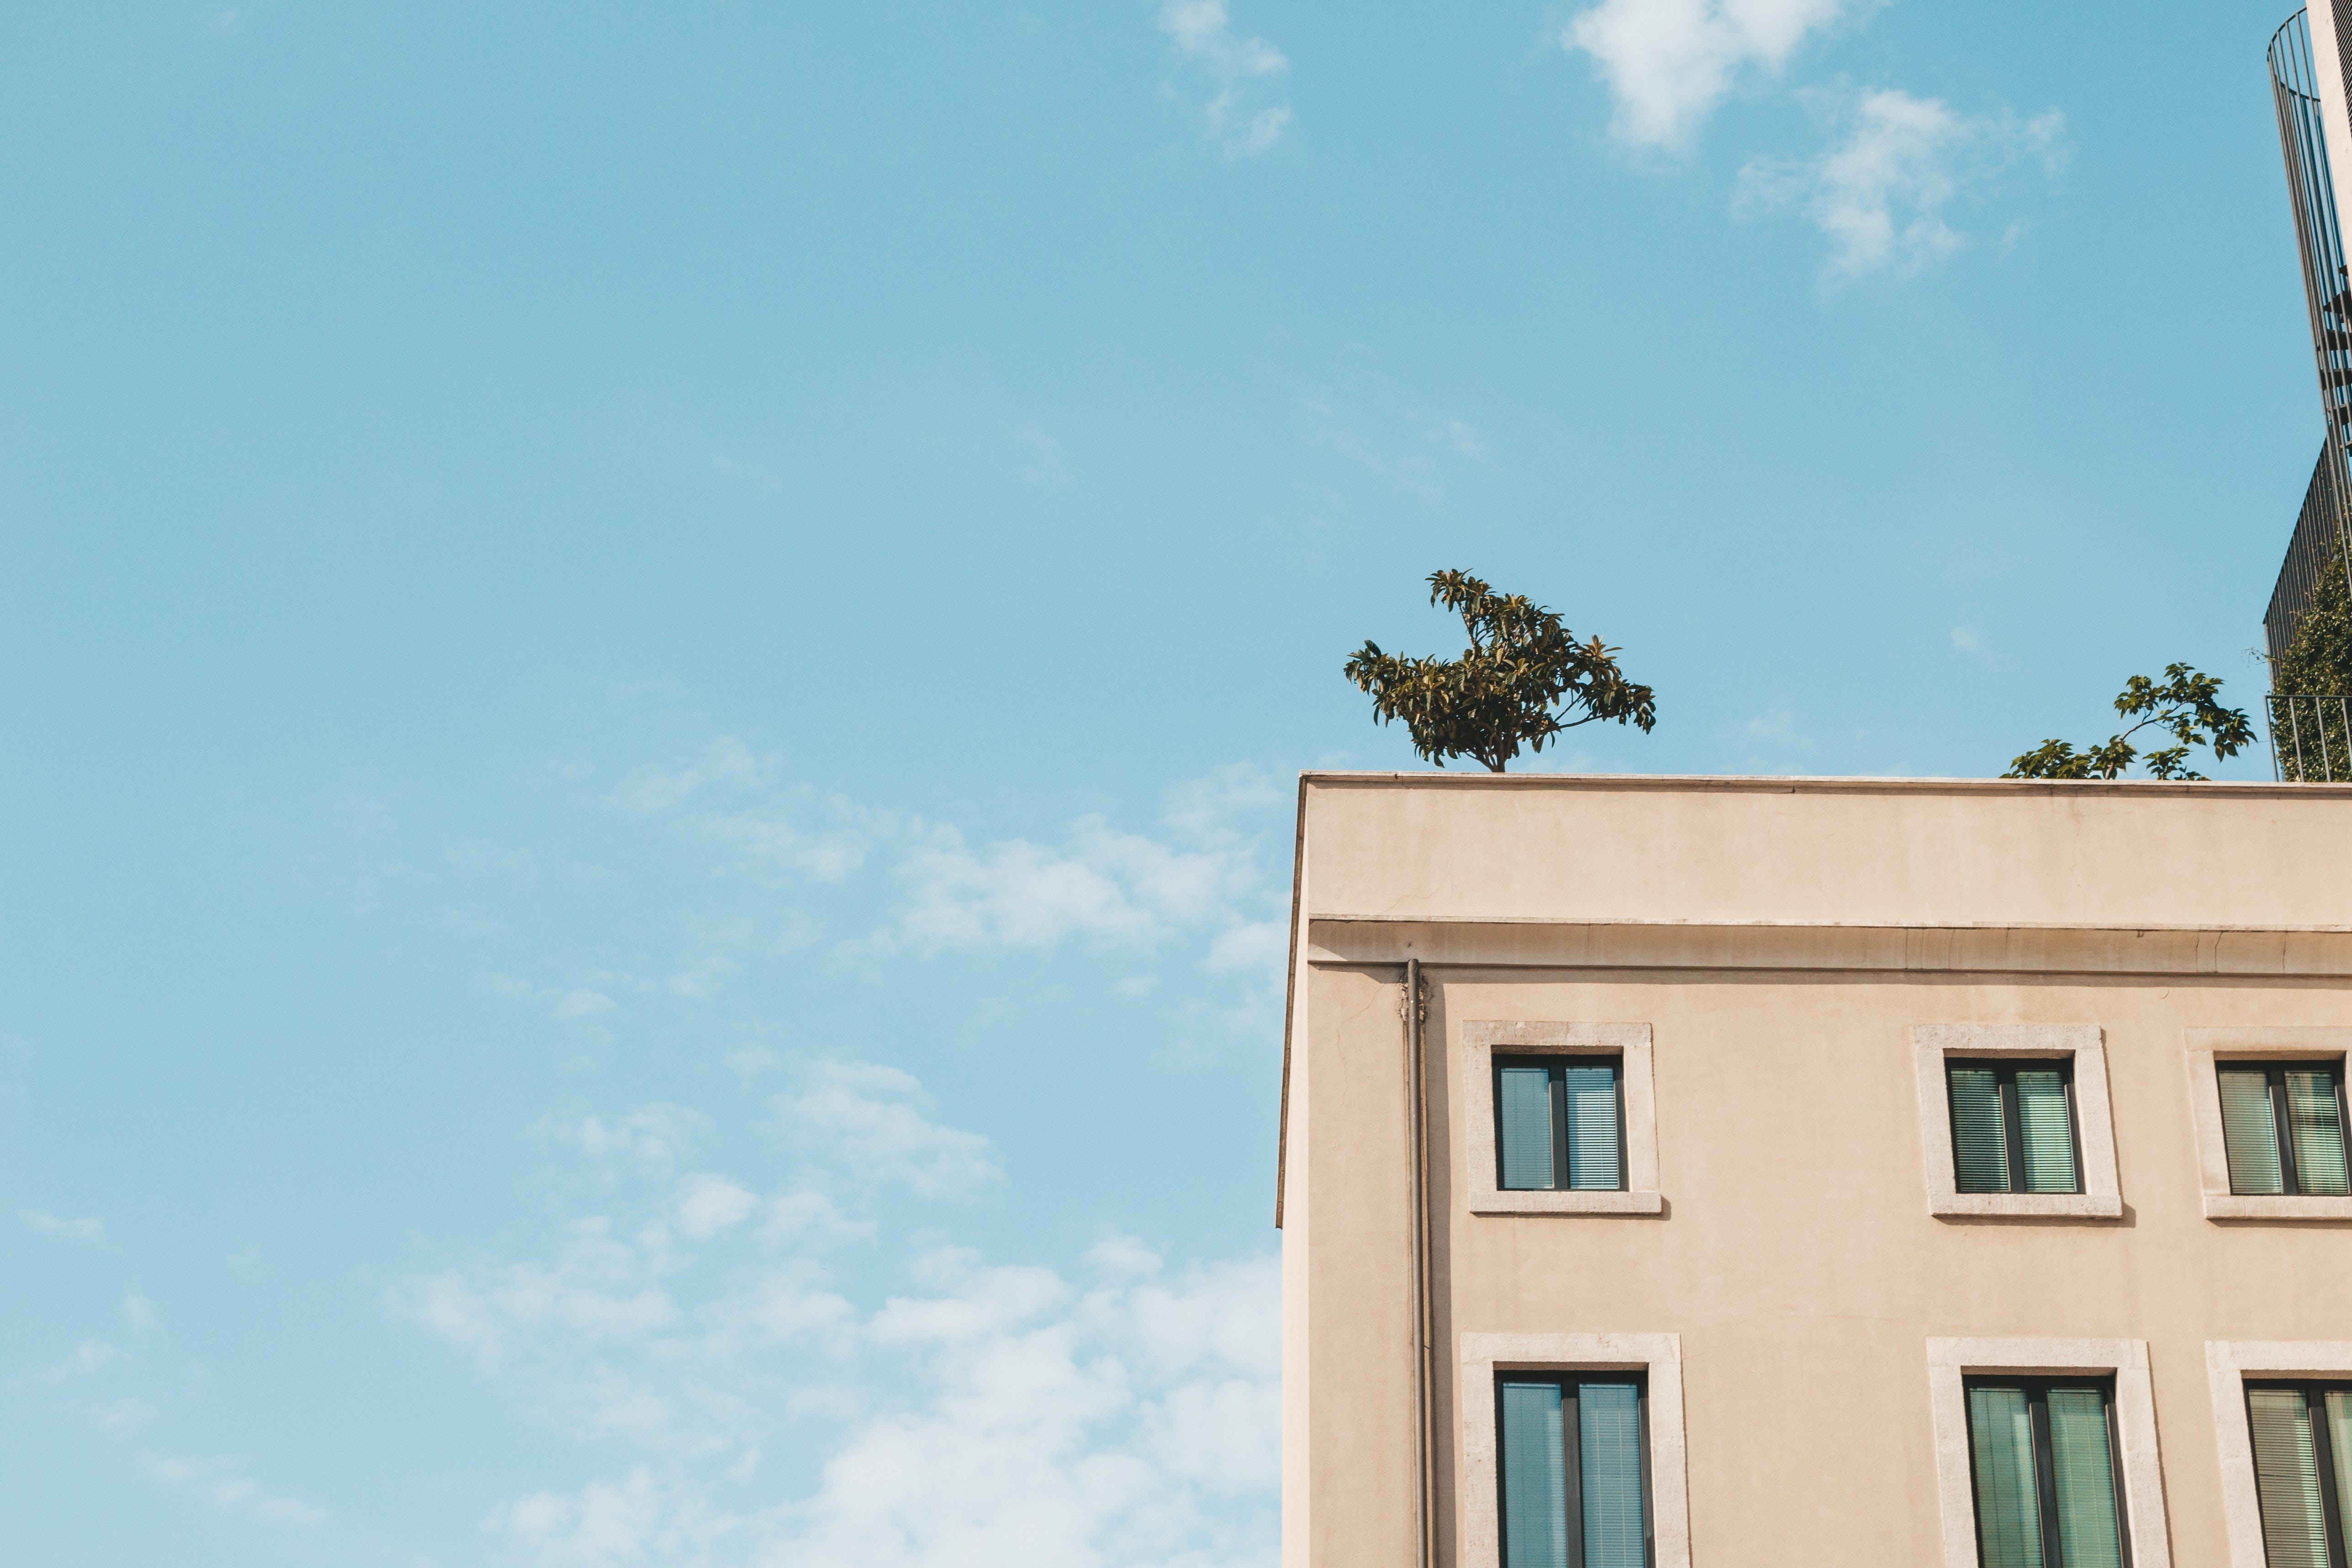 Gratis stockfoto met appartement, architectueel design, architectuur, blauwe lucht